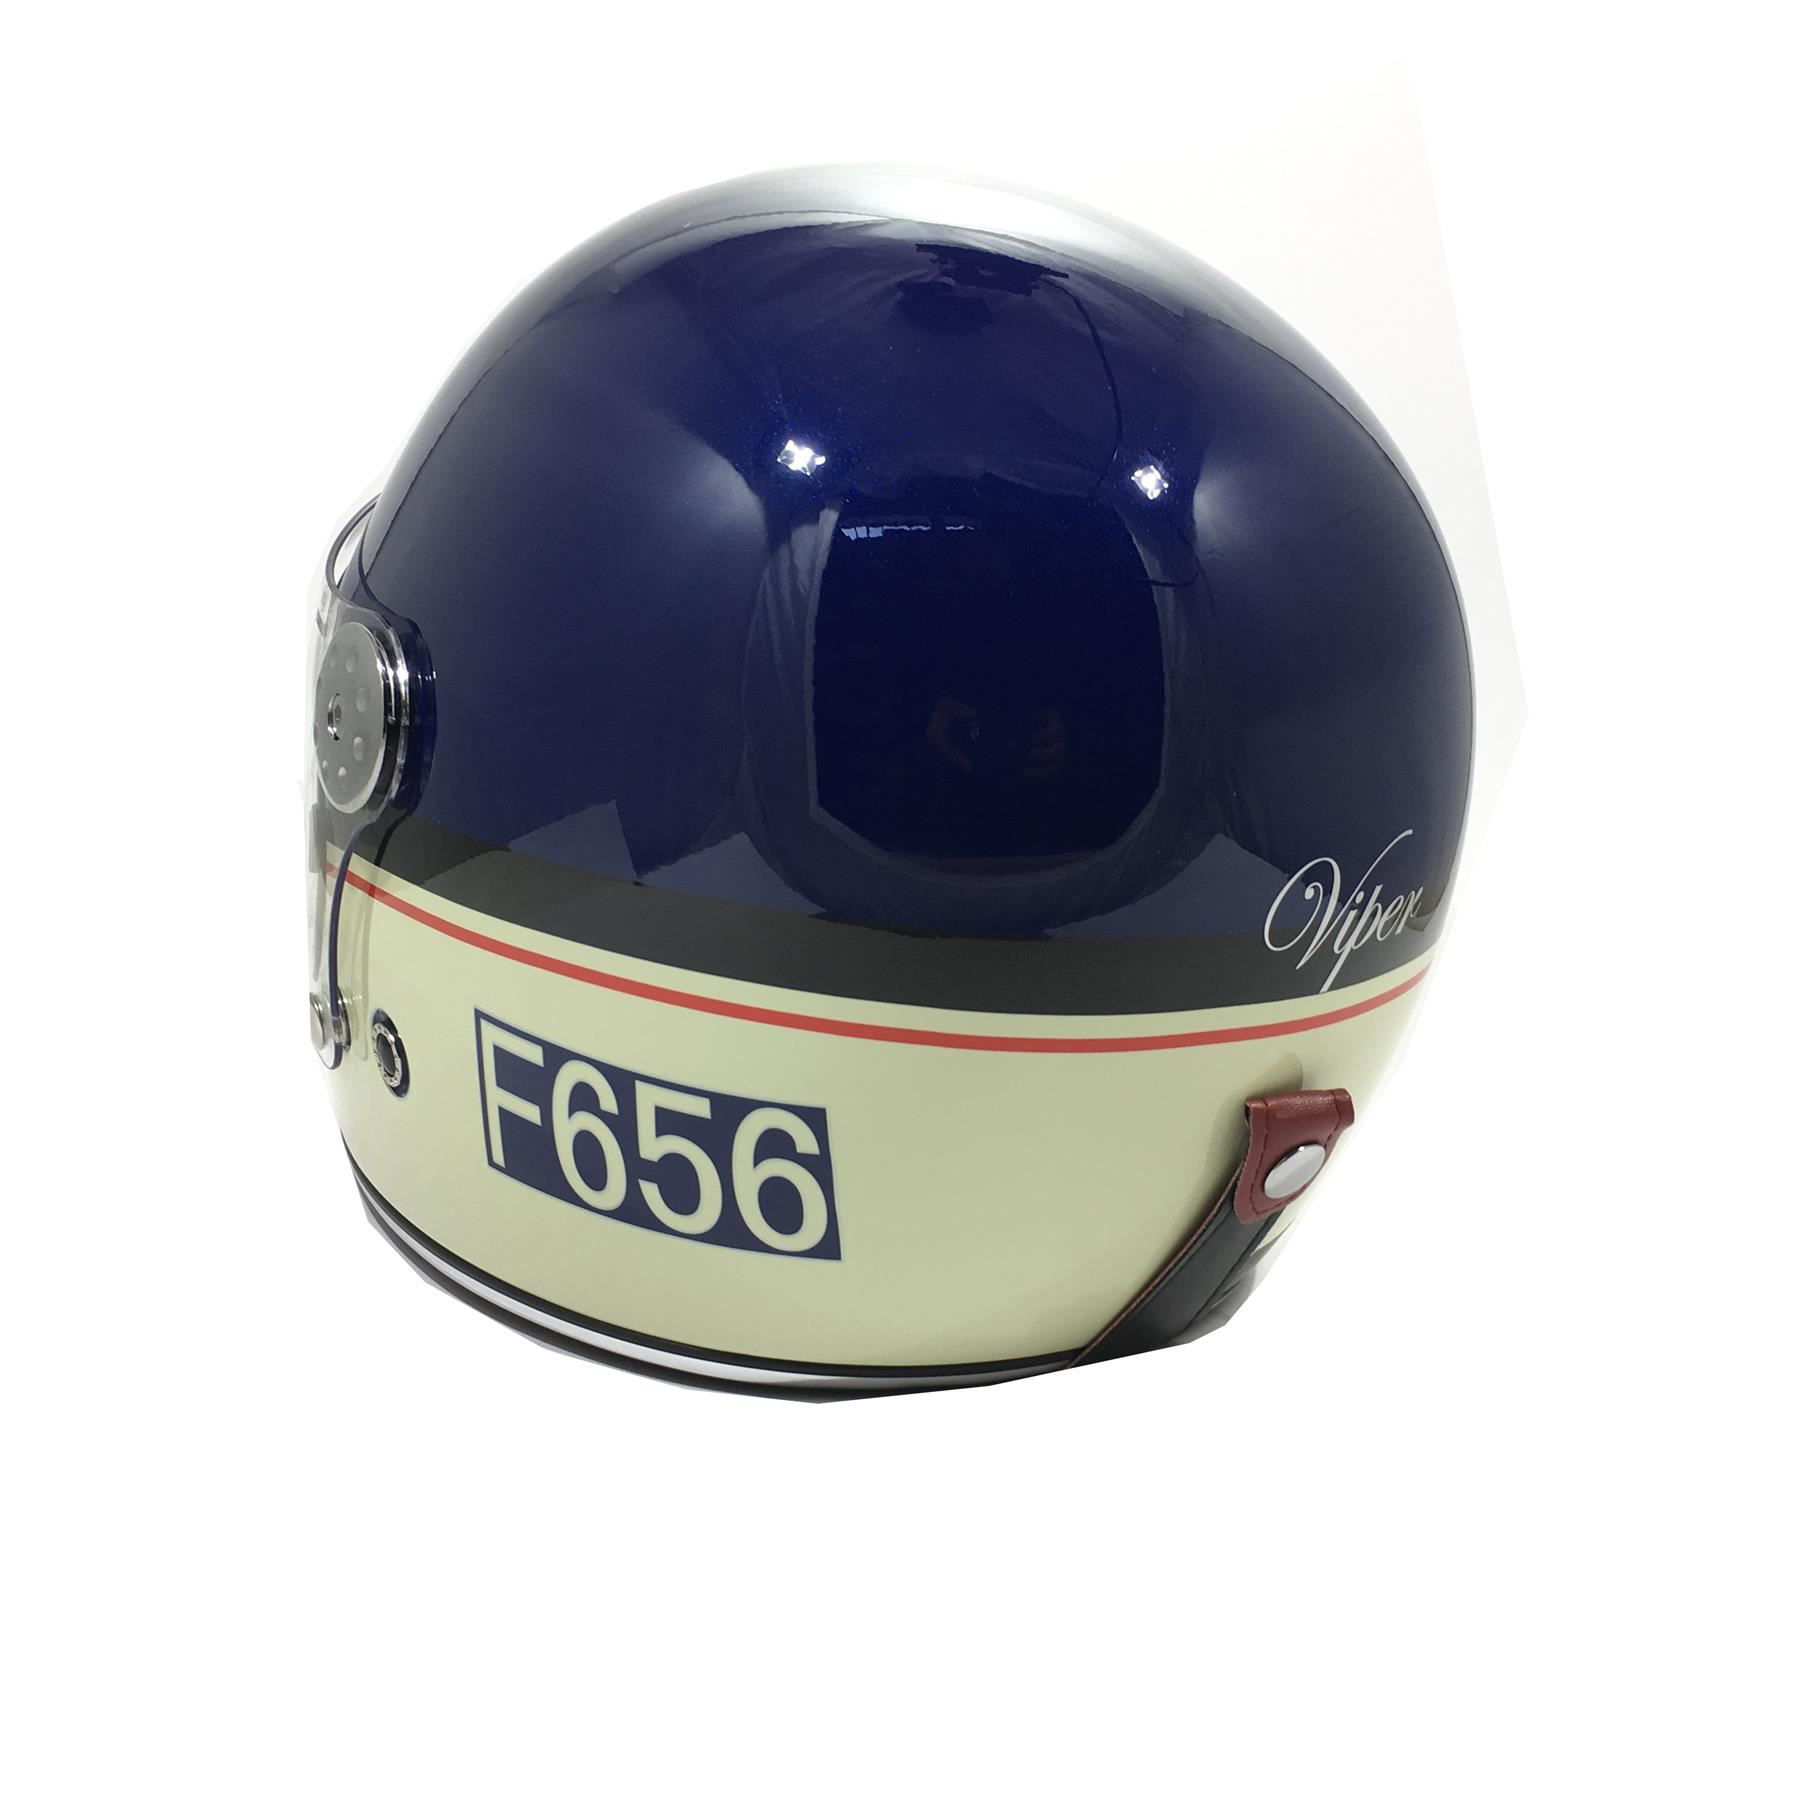 Viper-F656-Retro-Vintage-FibreGlass-Full-Face-Motorcycle-Bike-Road-Crash-Helmet miniature 22